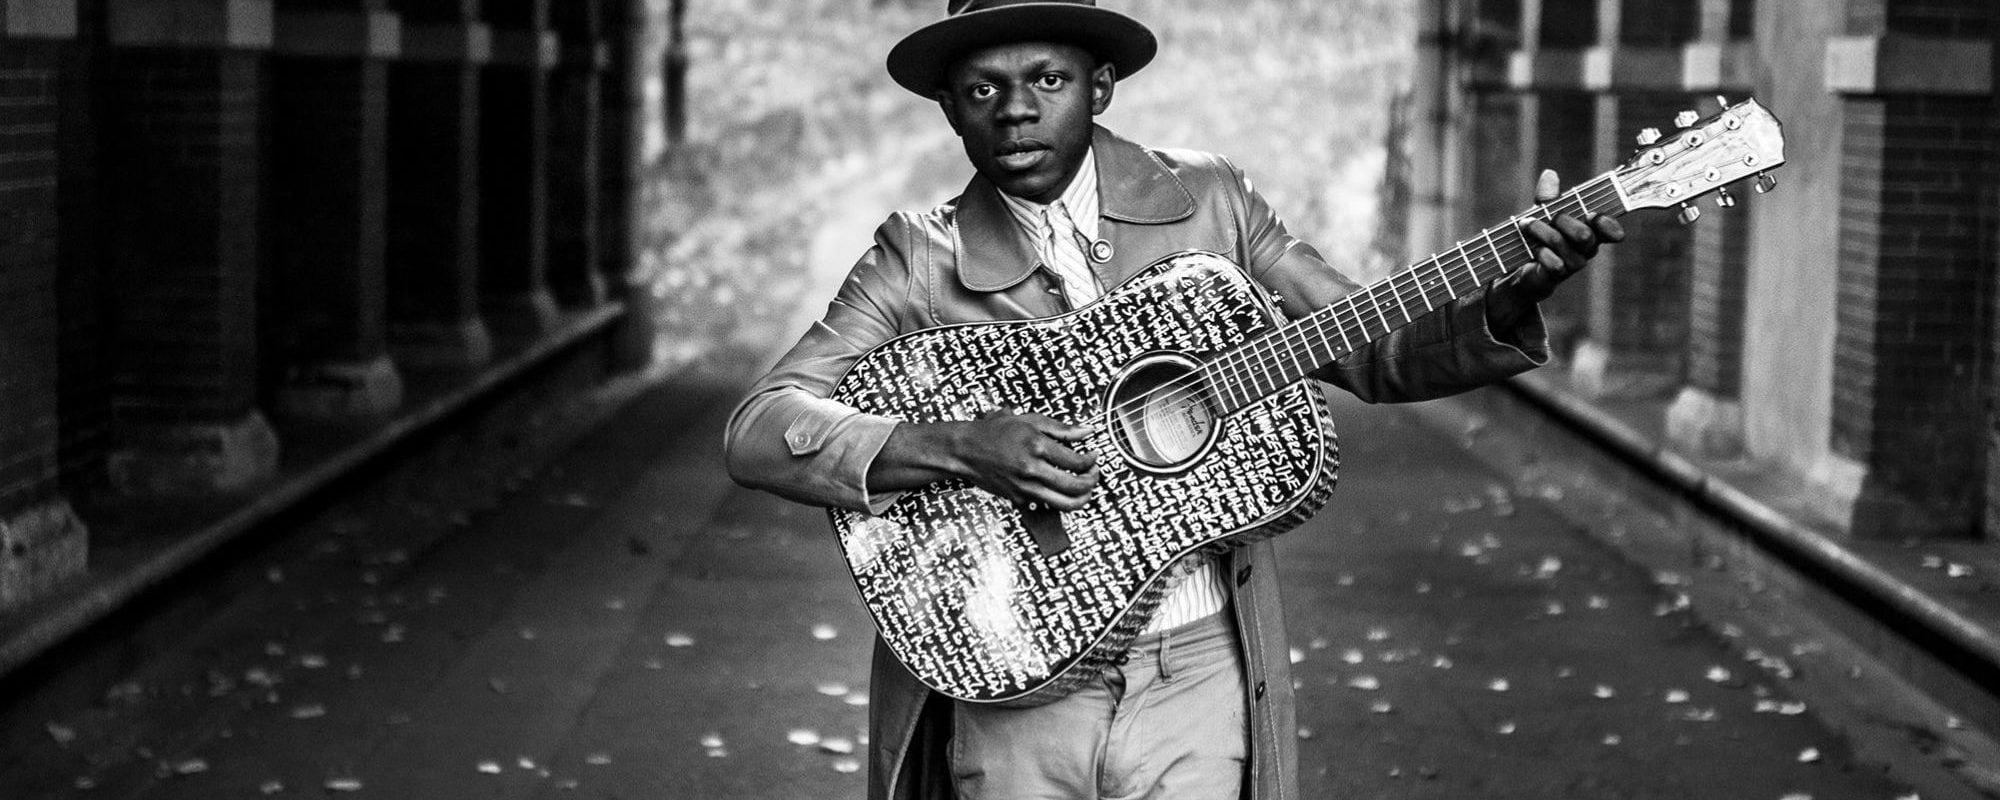 J.S. Ondara raconte son rêve folk américain à l'Espace Django vendredi